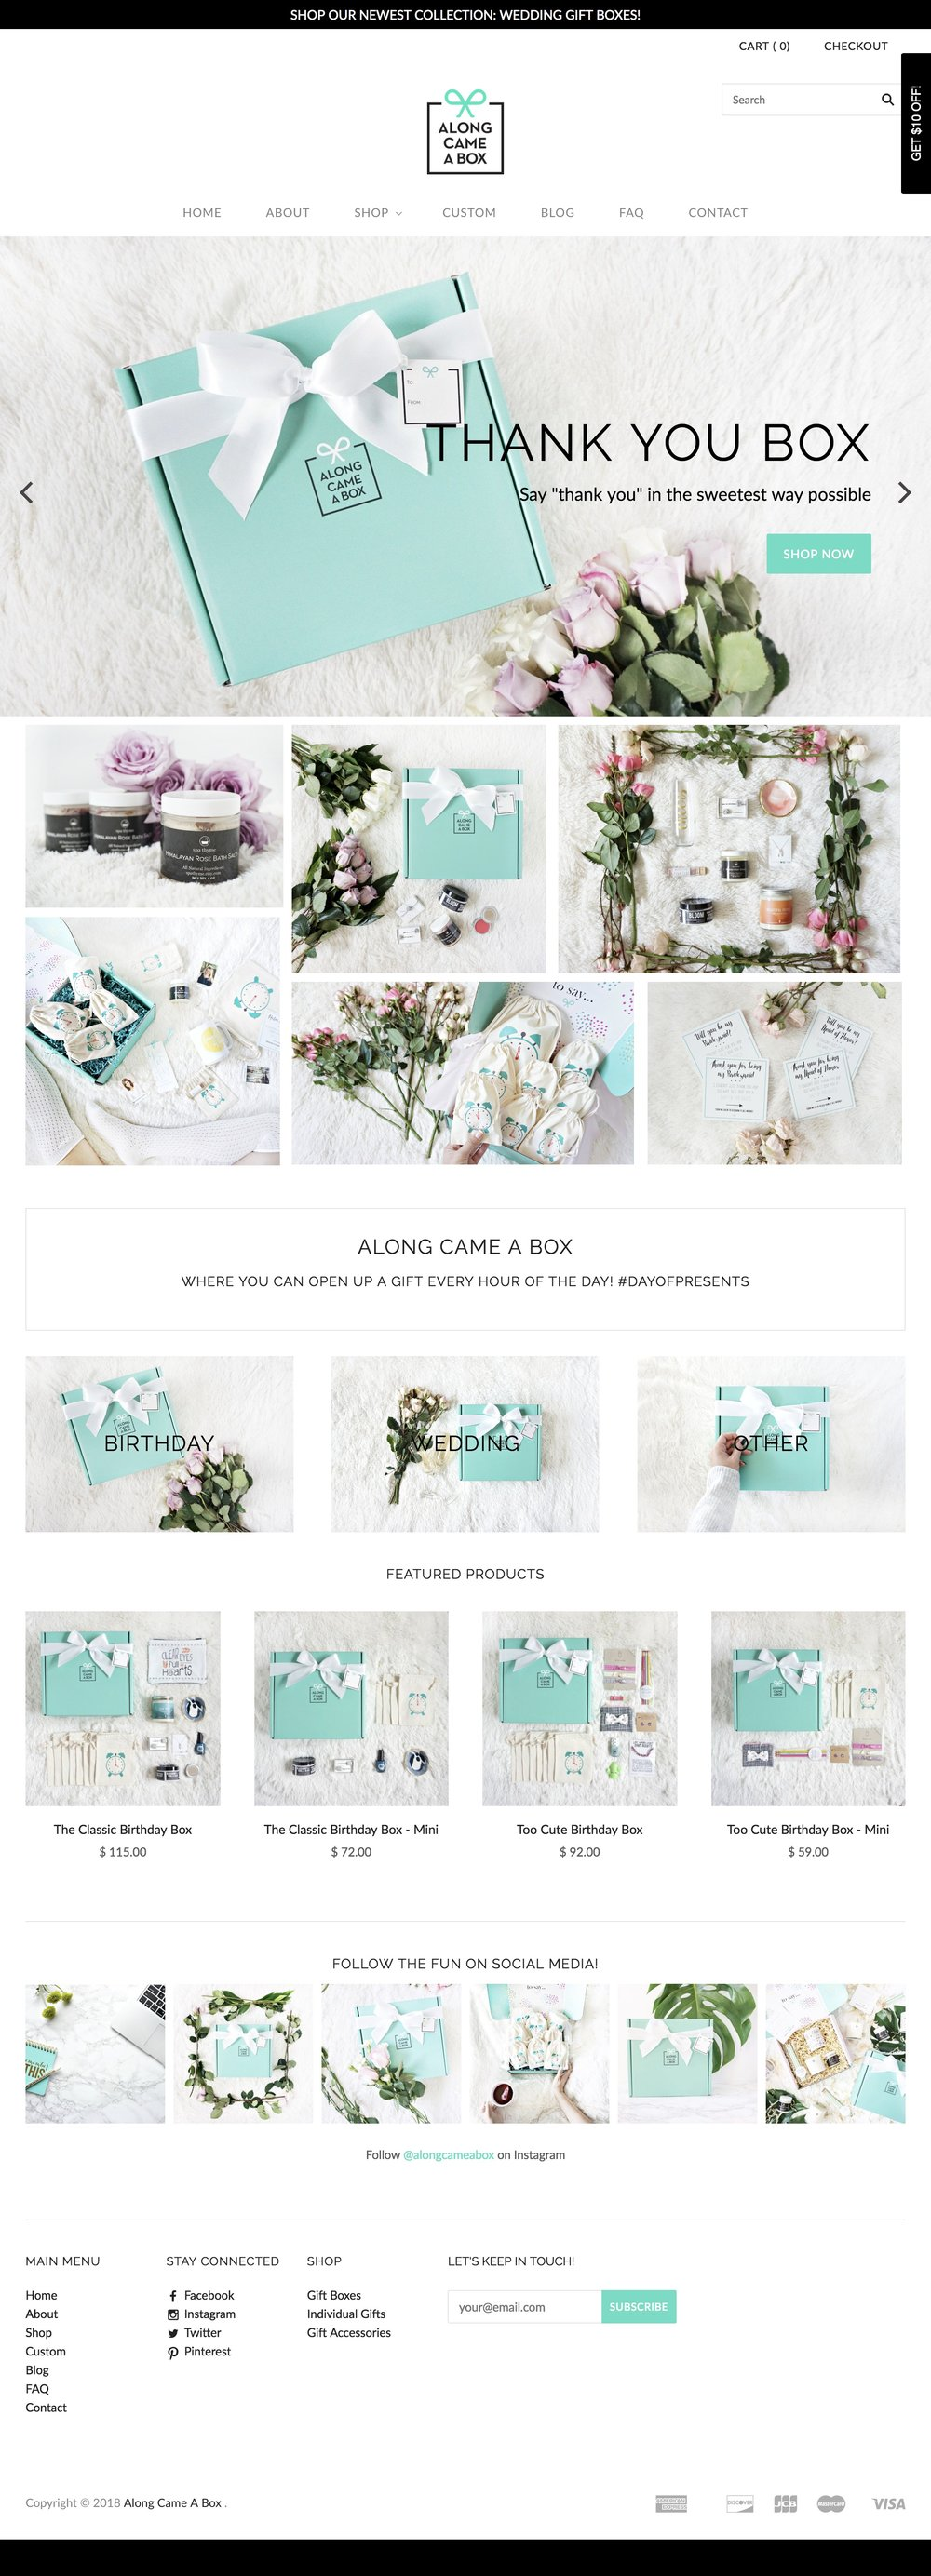 kristen-fulchi-design-studio-custom-shopify-website-along-came-a-box-custom-web-design-for-creatives.jpg